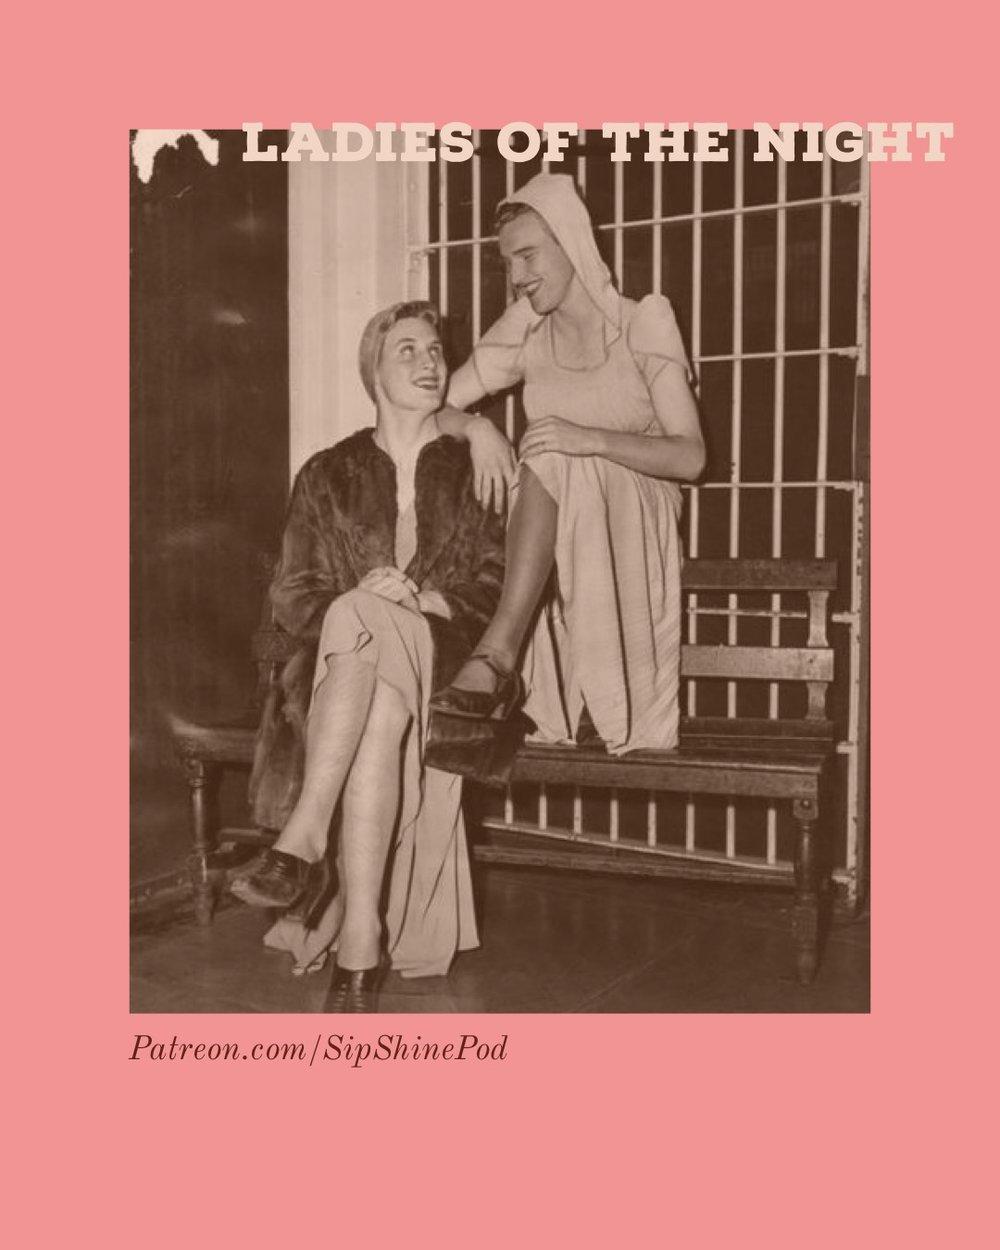 Ladies Of the Night.JPG